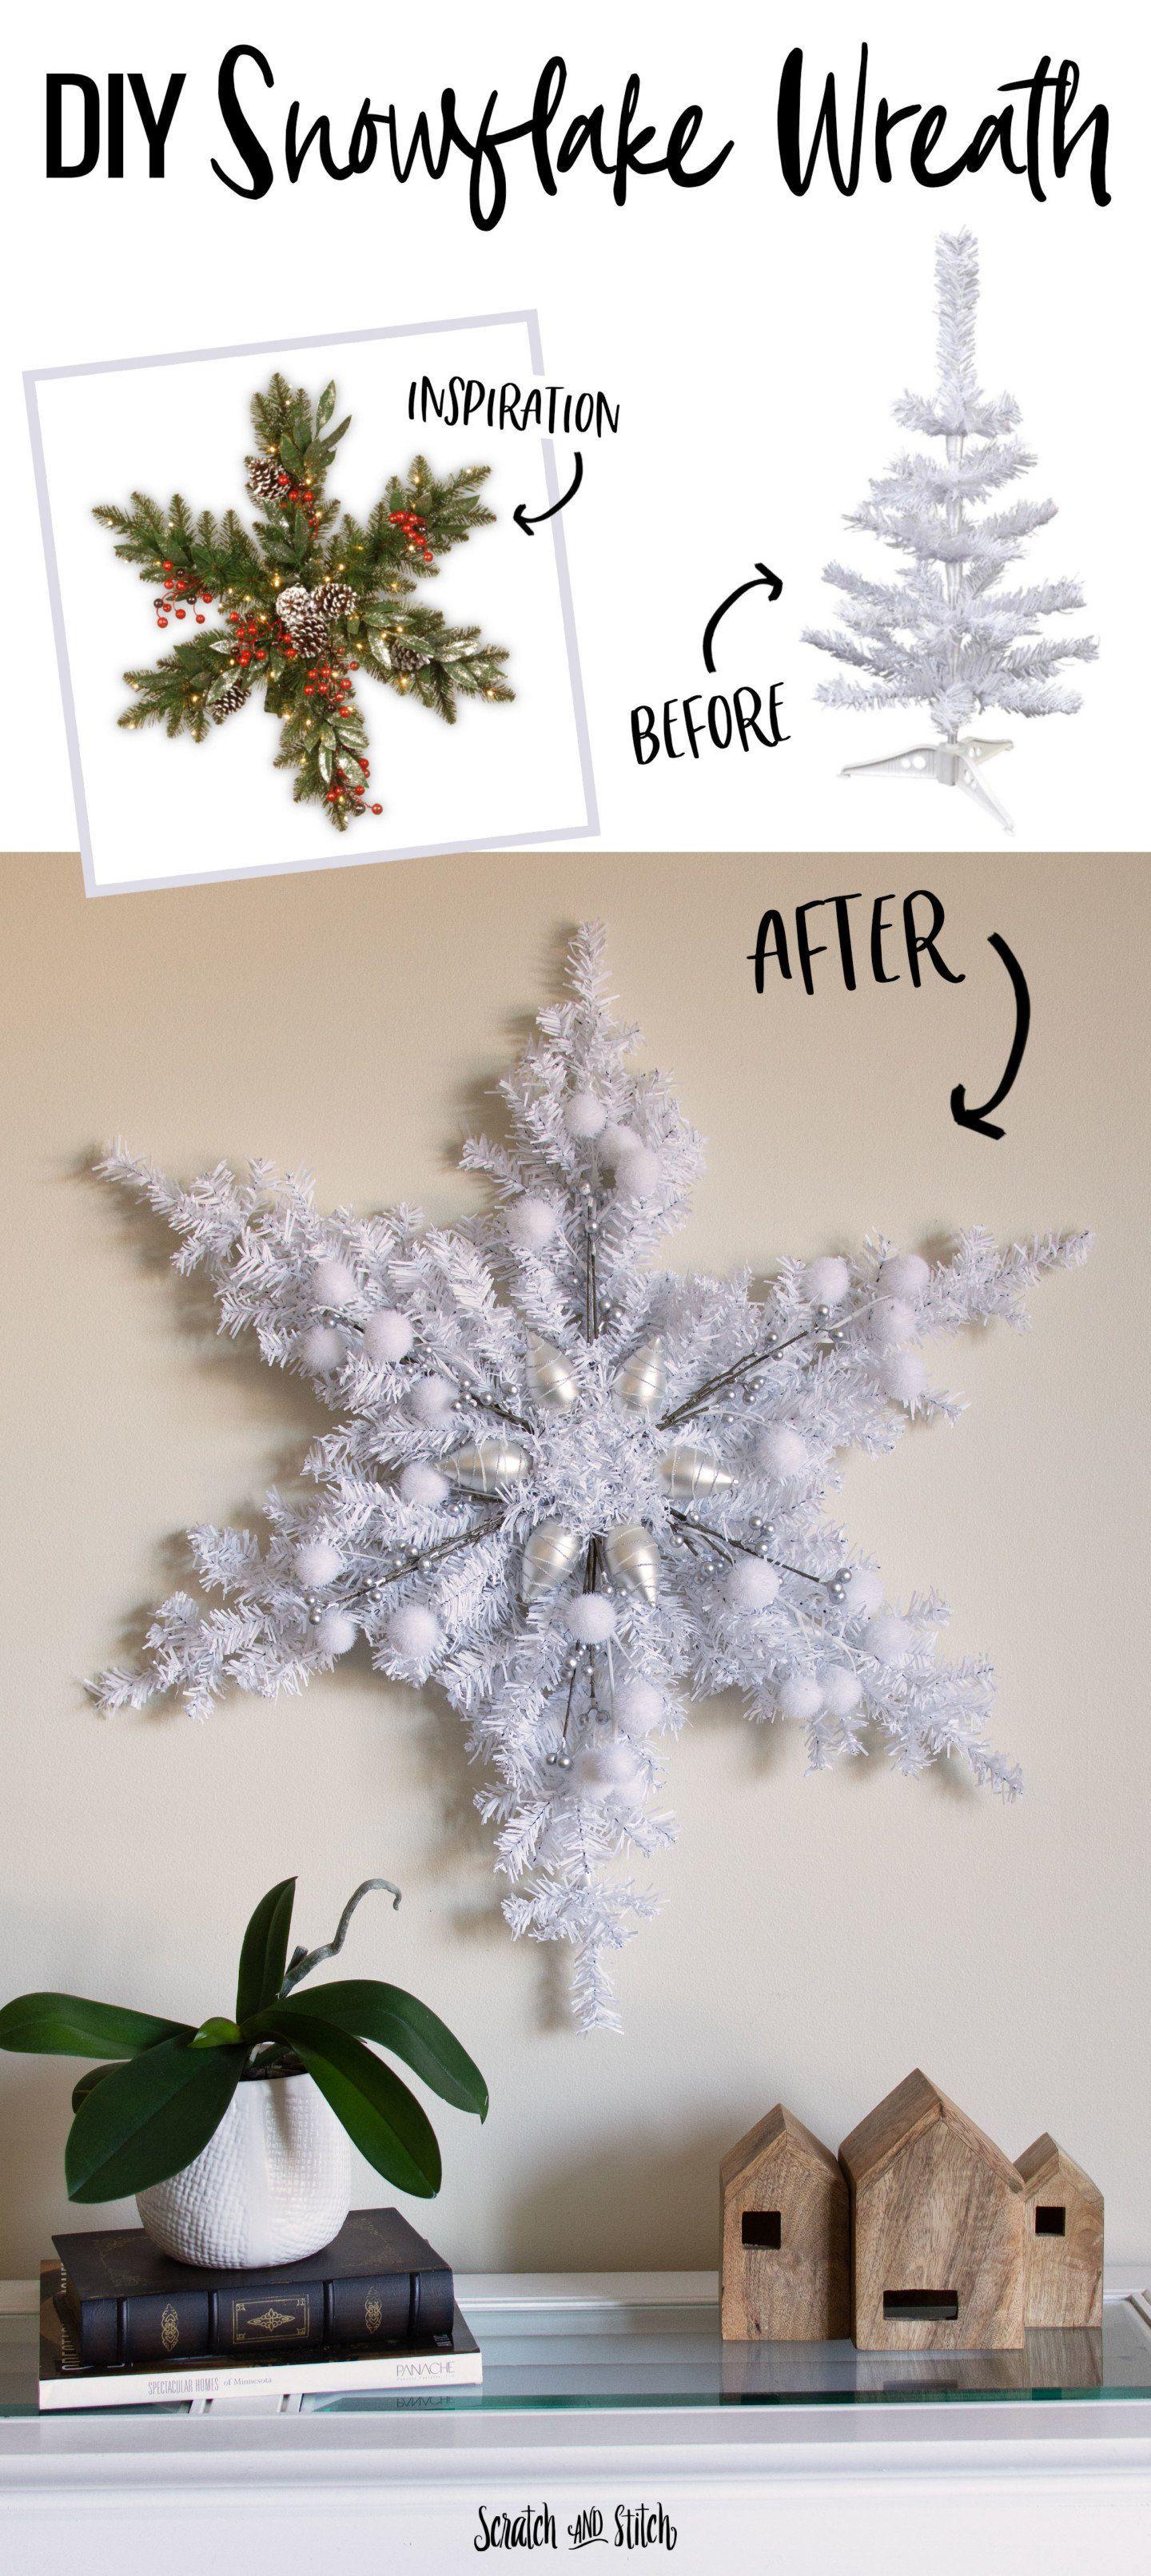 Make This Oversized Snowflake Using Mini Christmas Trees Fo Diy Christmas Decorations Dollar Store Dollar Tree Christmas Decor Christmas Snowflakes Decorations